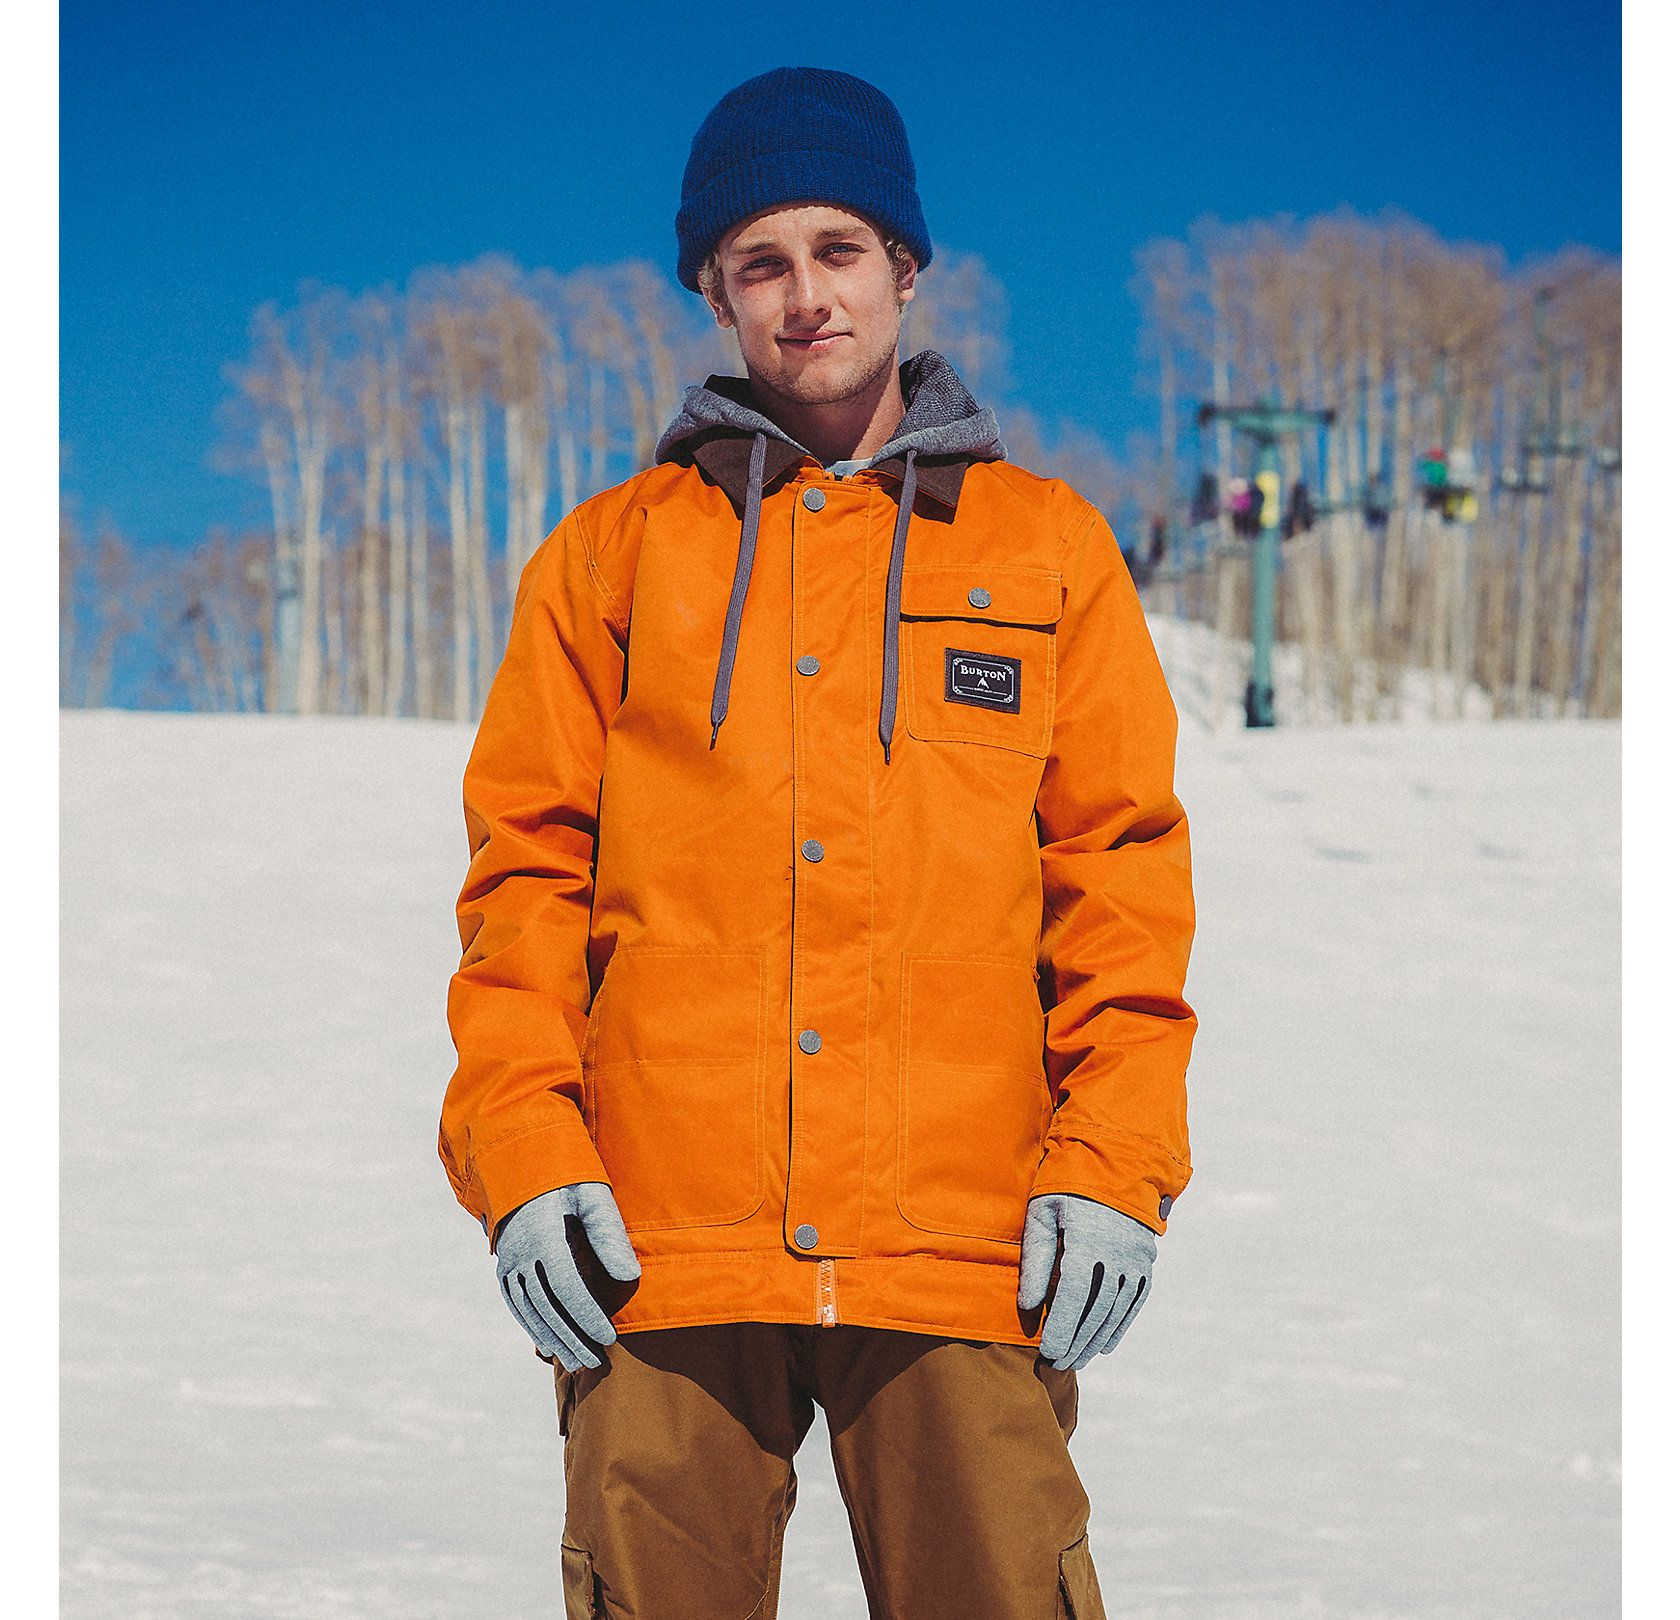 87aa84c548 Burton Dunmore Jacket | snowboard | Jackets, Winter jackets, Burton ...